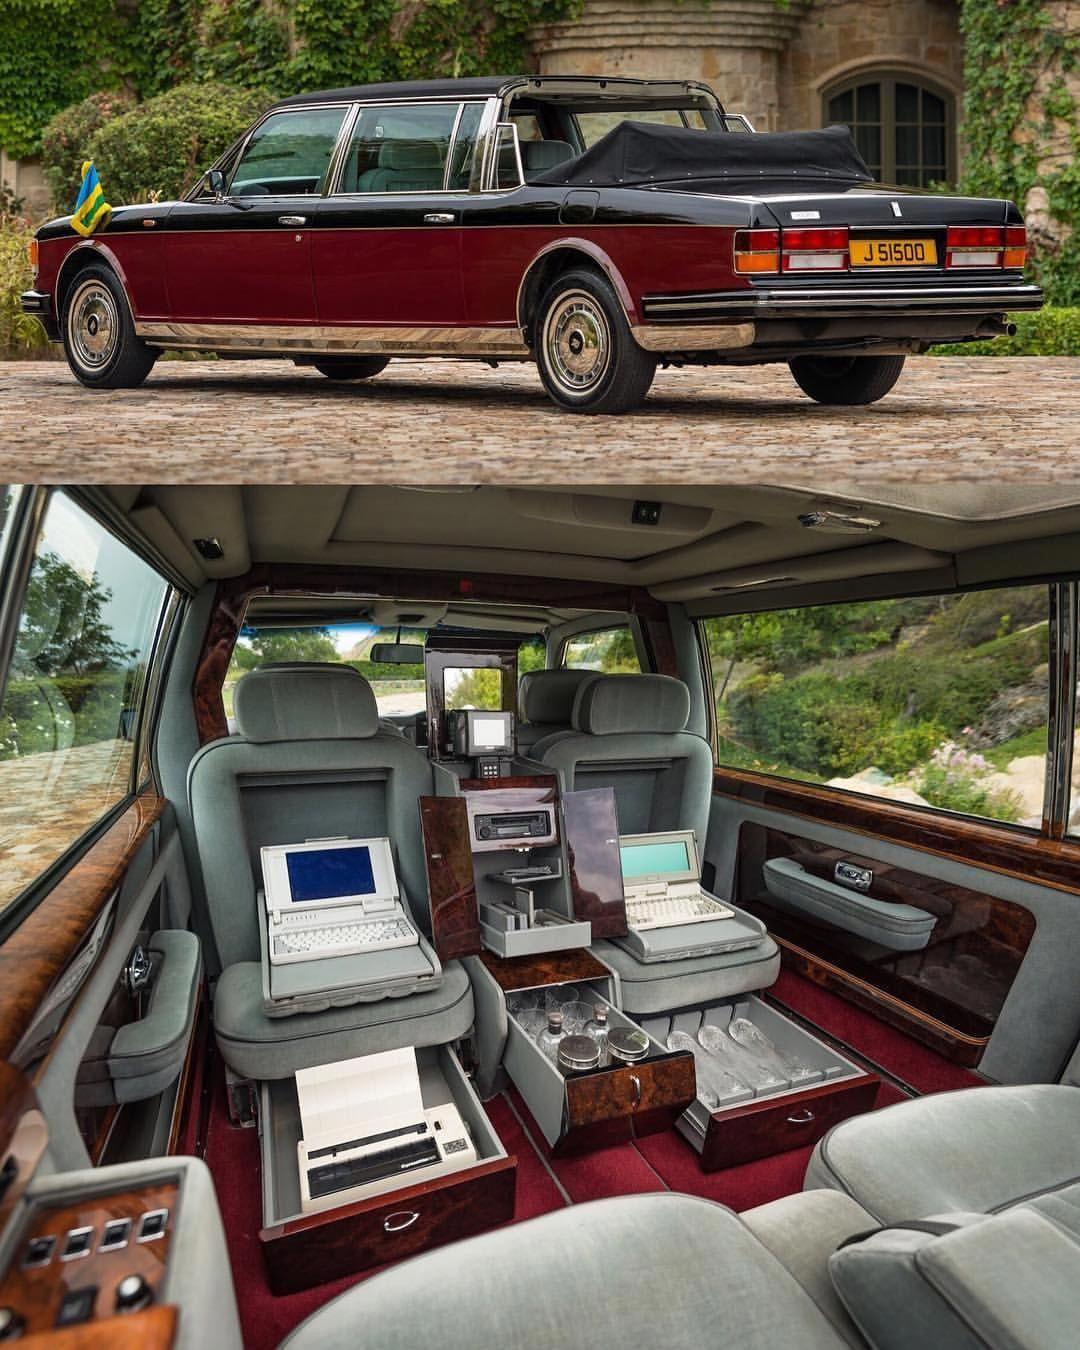 Bentley State Limousine: 1989 Rolls-Royce Silver Spirit I Emperor State Landaulet